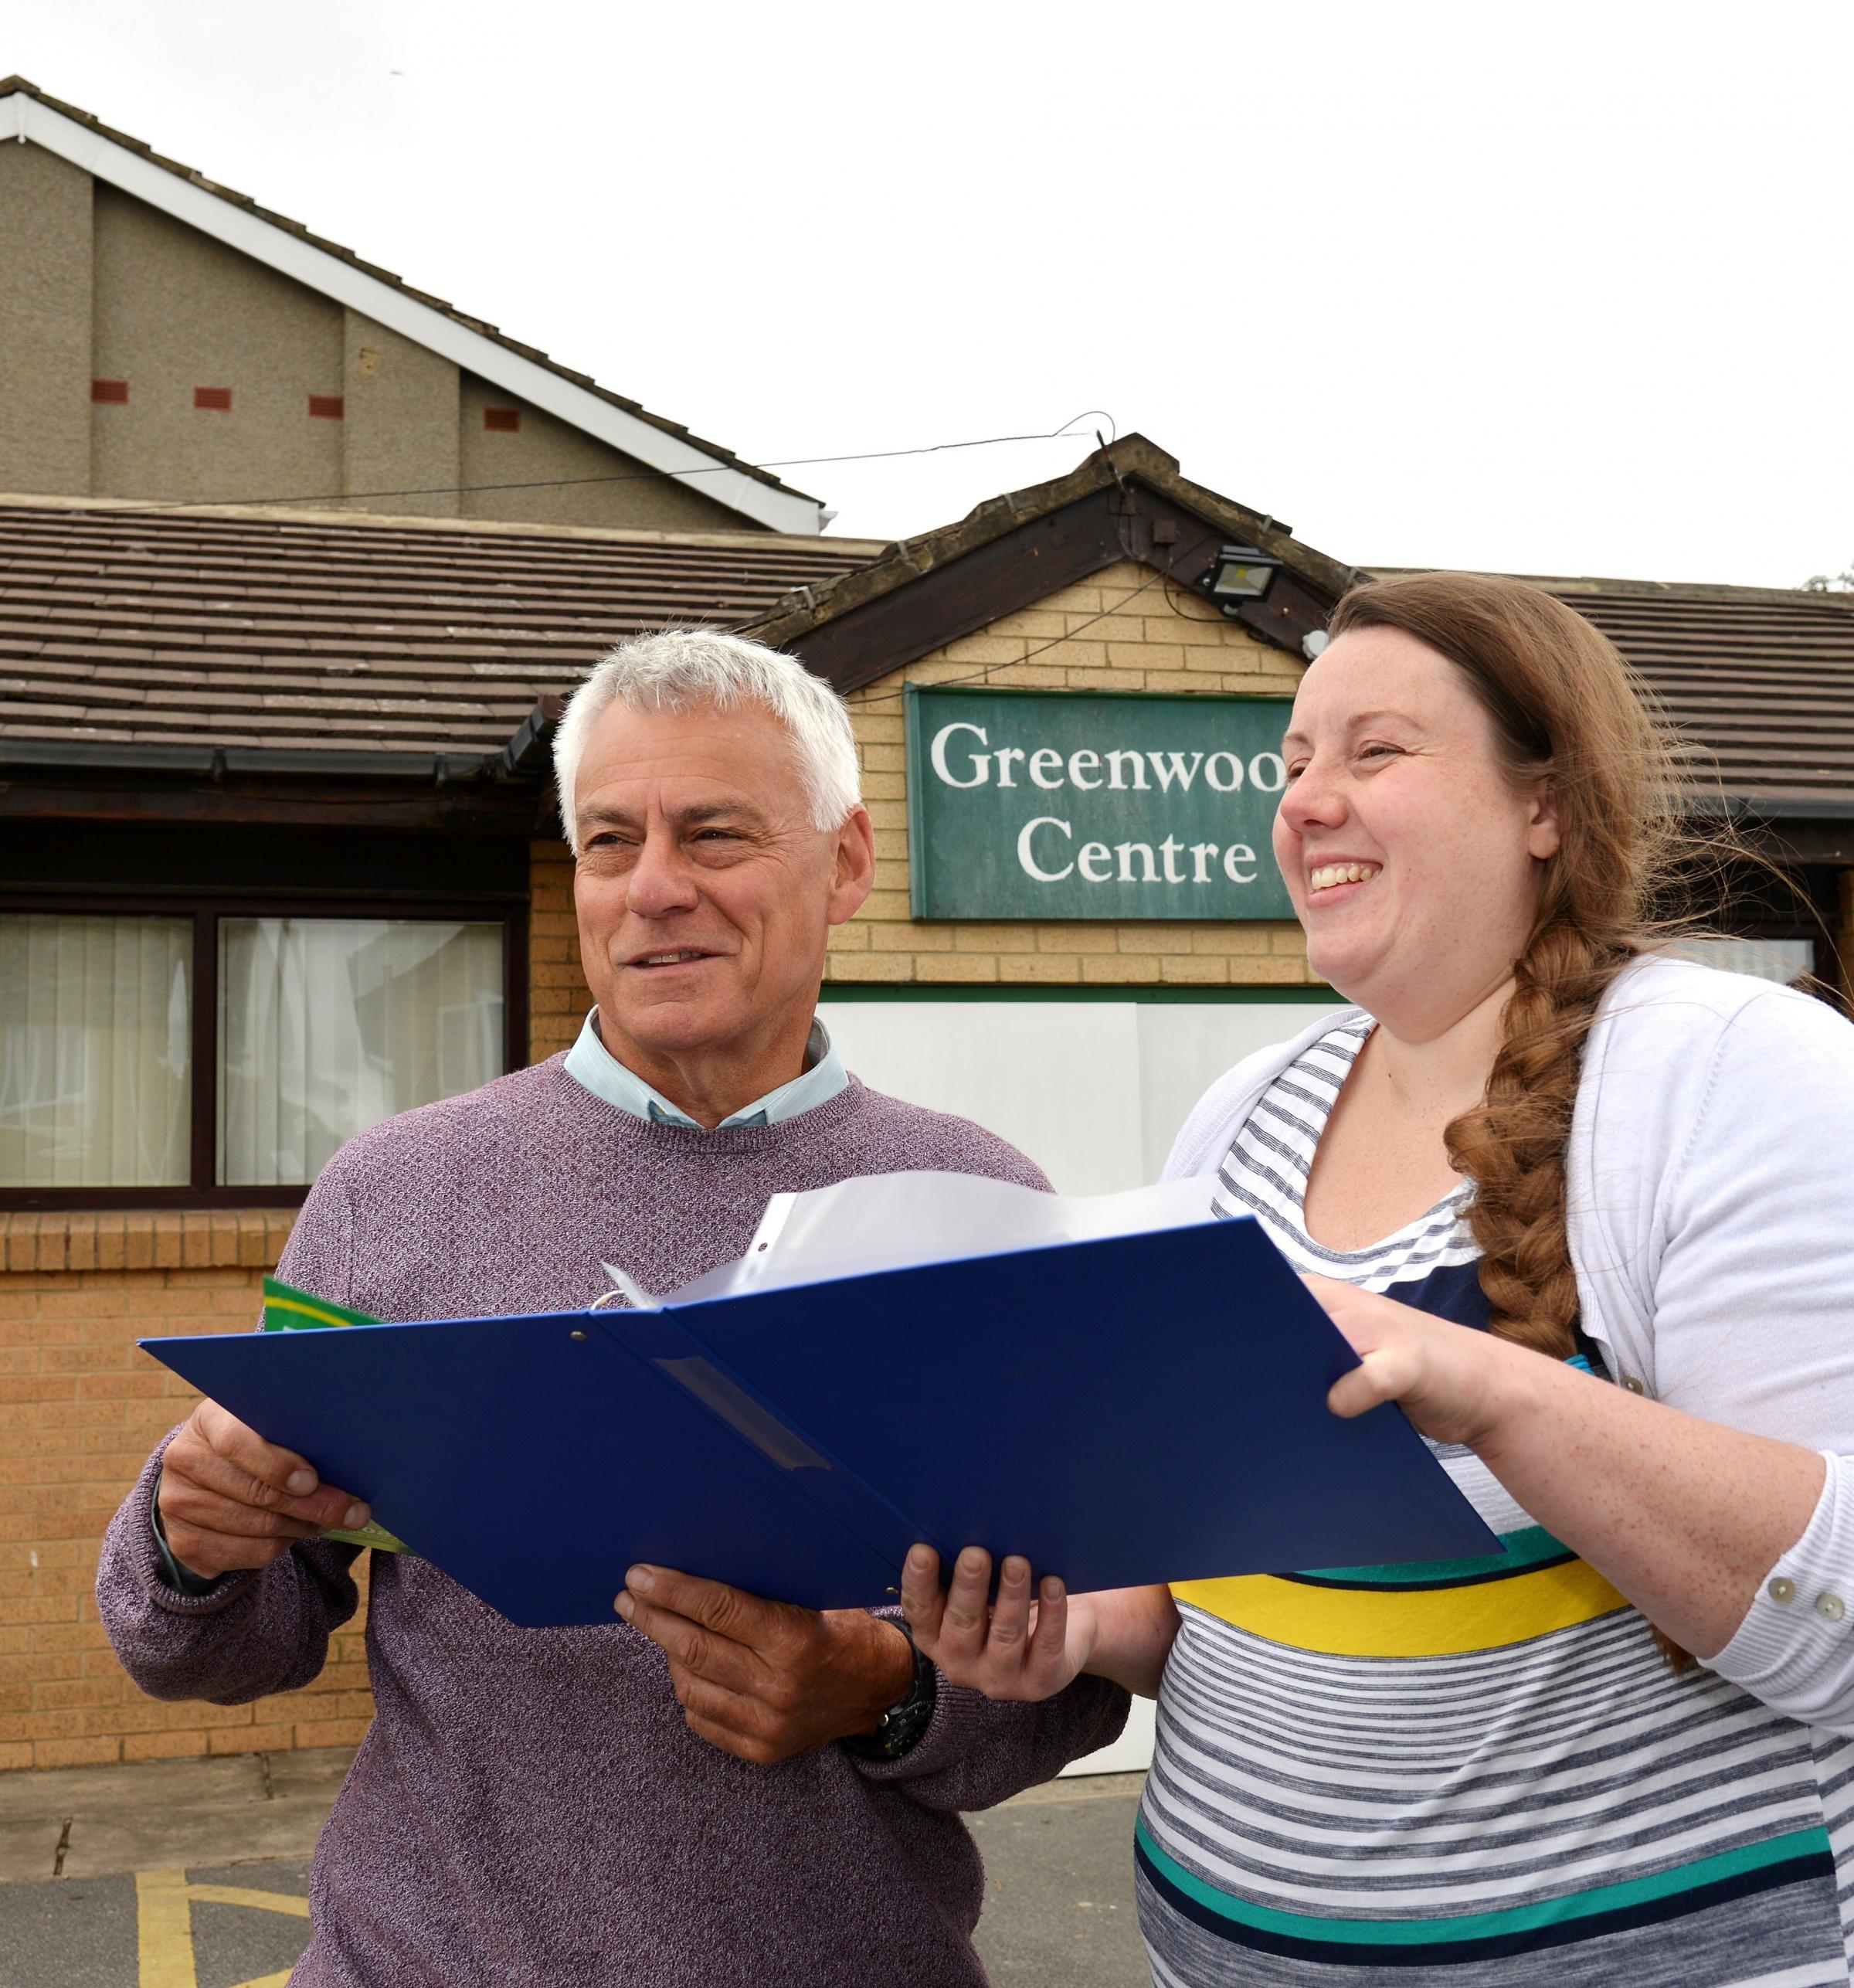 Councillors David Ward and Rachel Sunderland at the Greenwood Centre